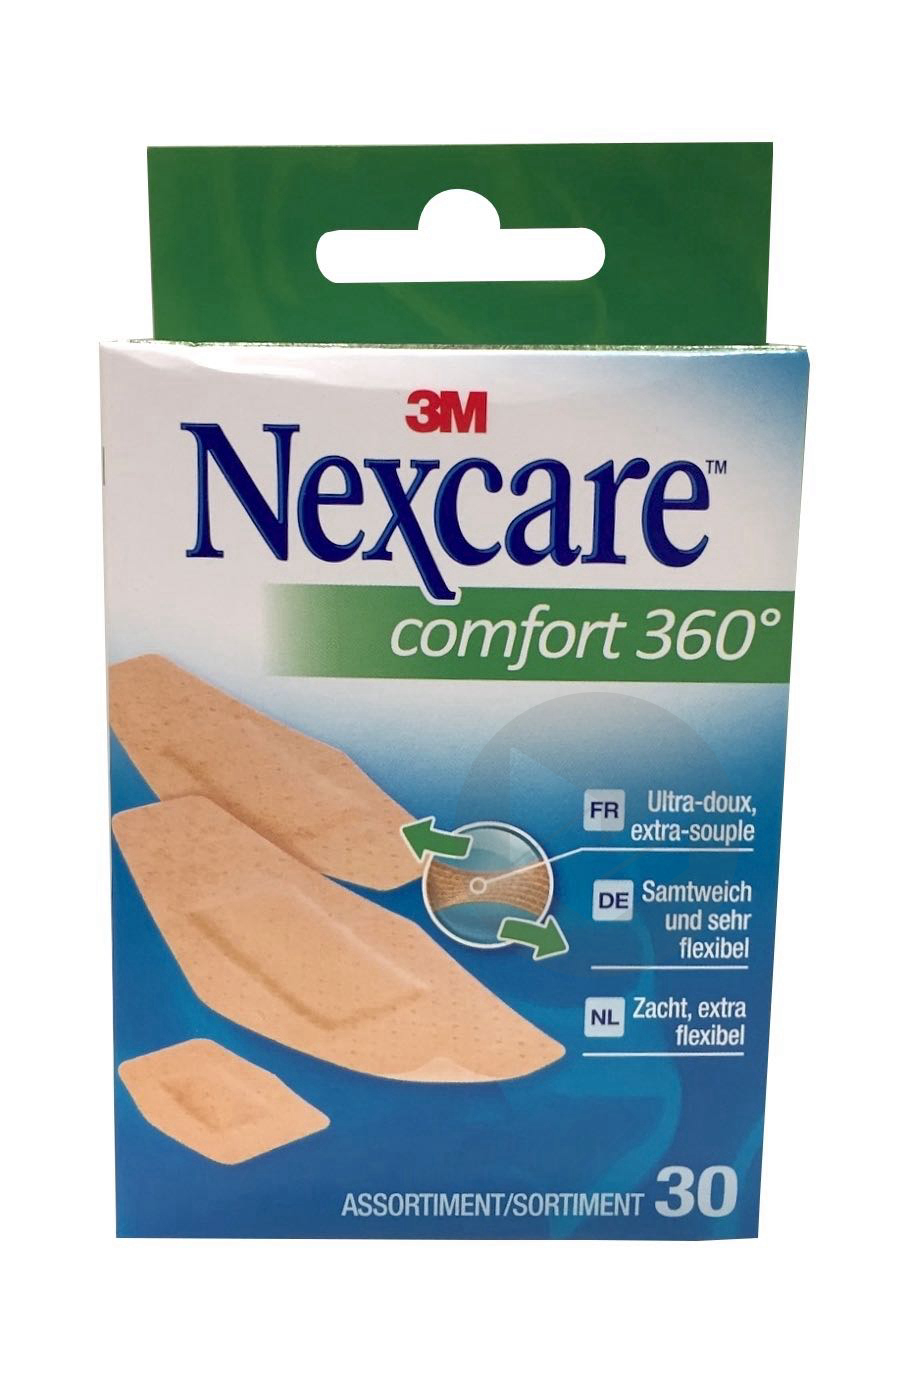 Nexcare Comfort 360